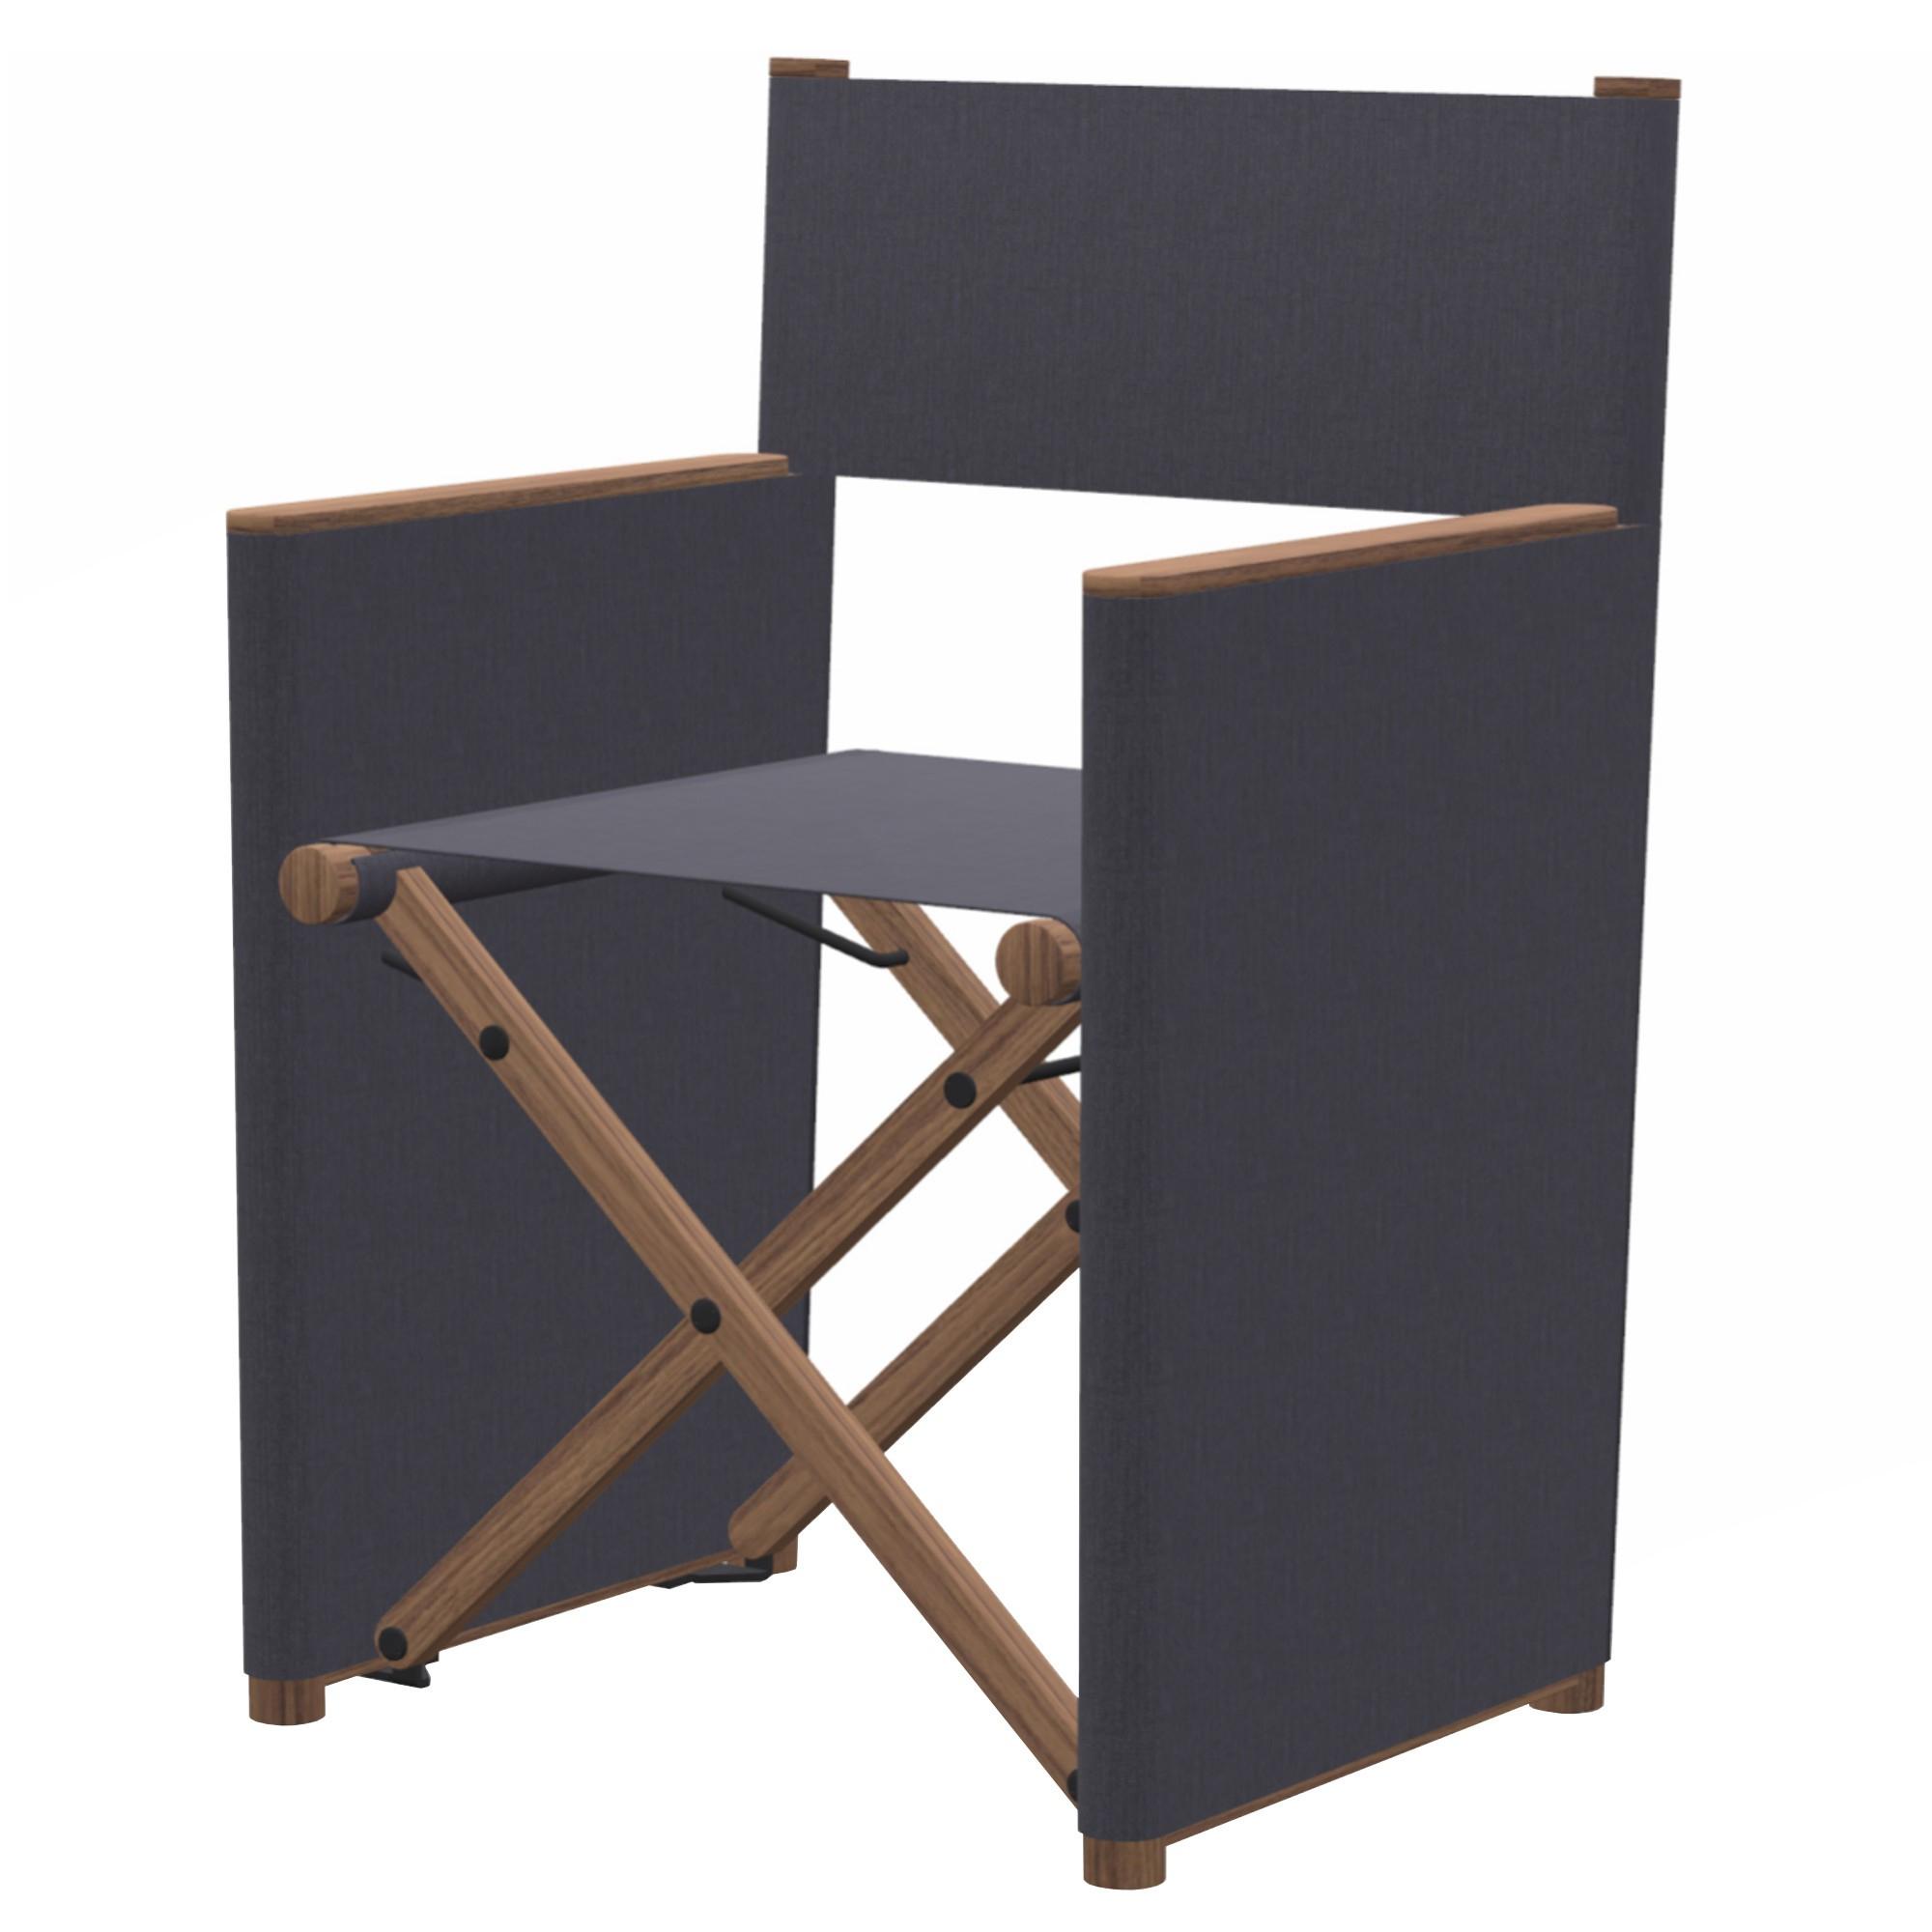 Orson Director Armchair   Armchairs   Seats   Roda Inside Orsen Tv Stands (View 11 of 20)